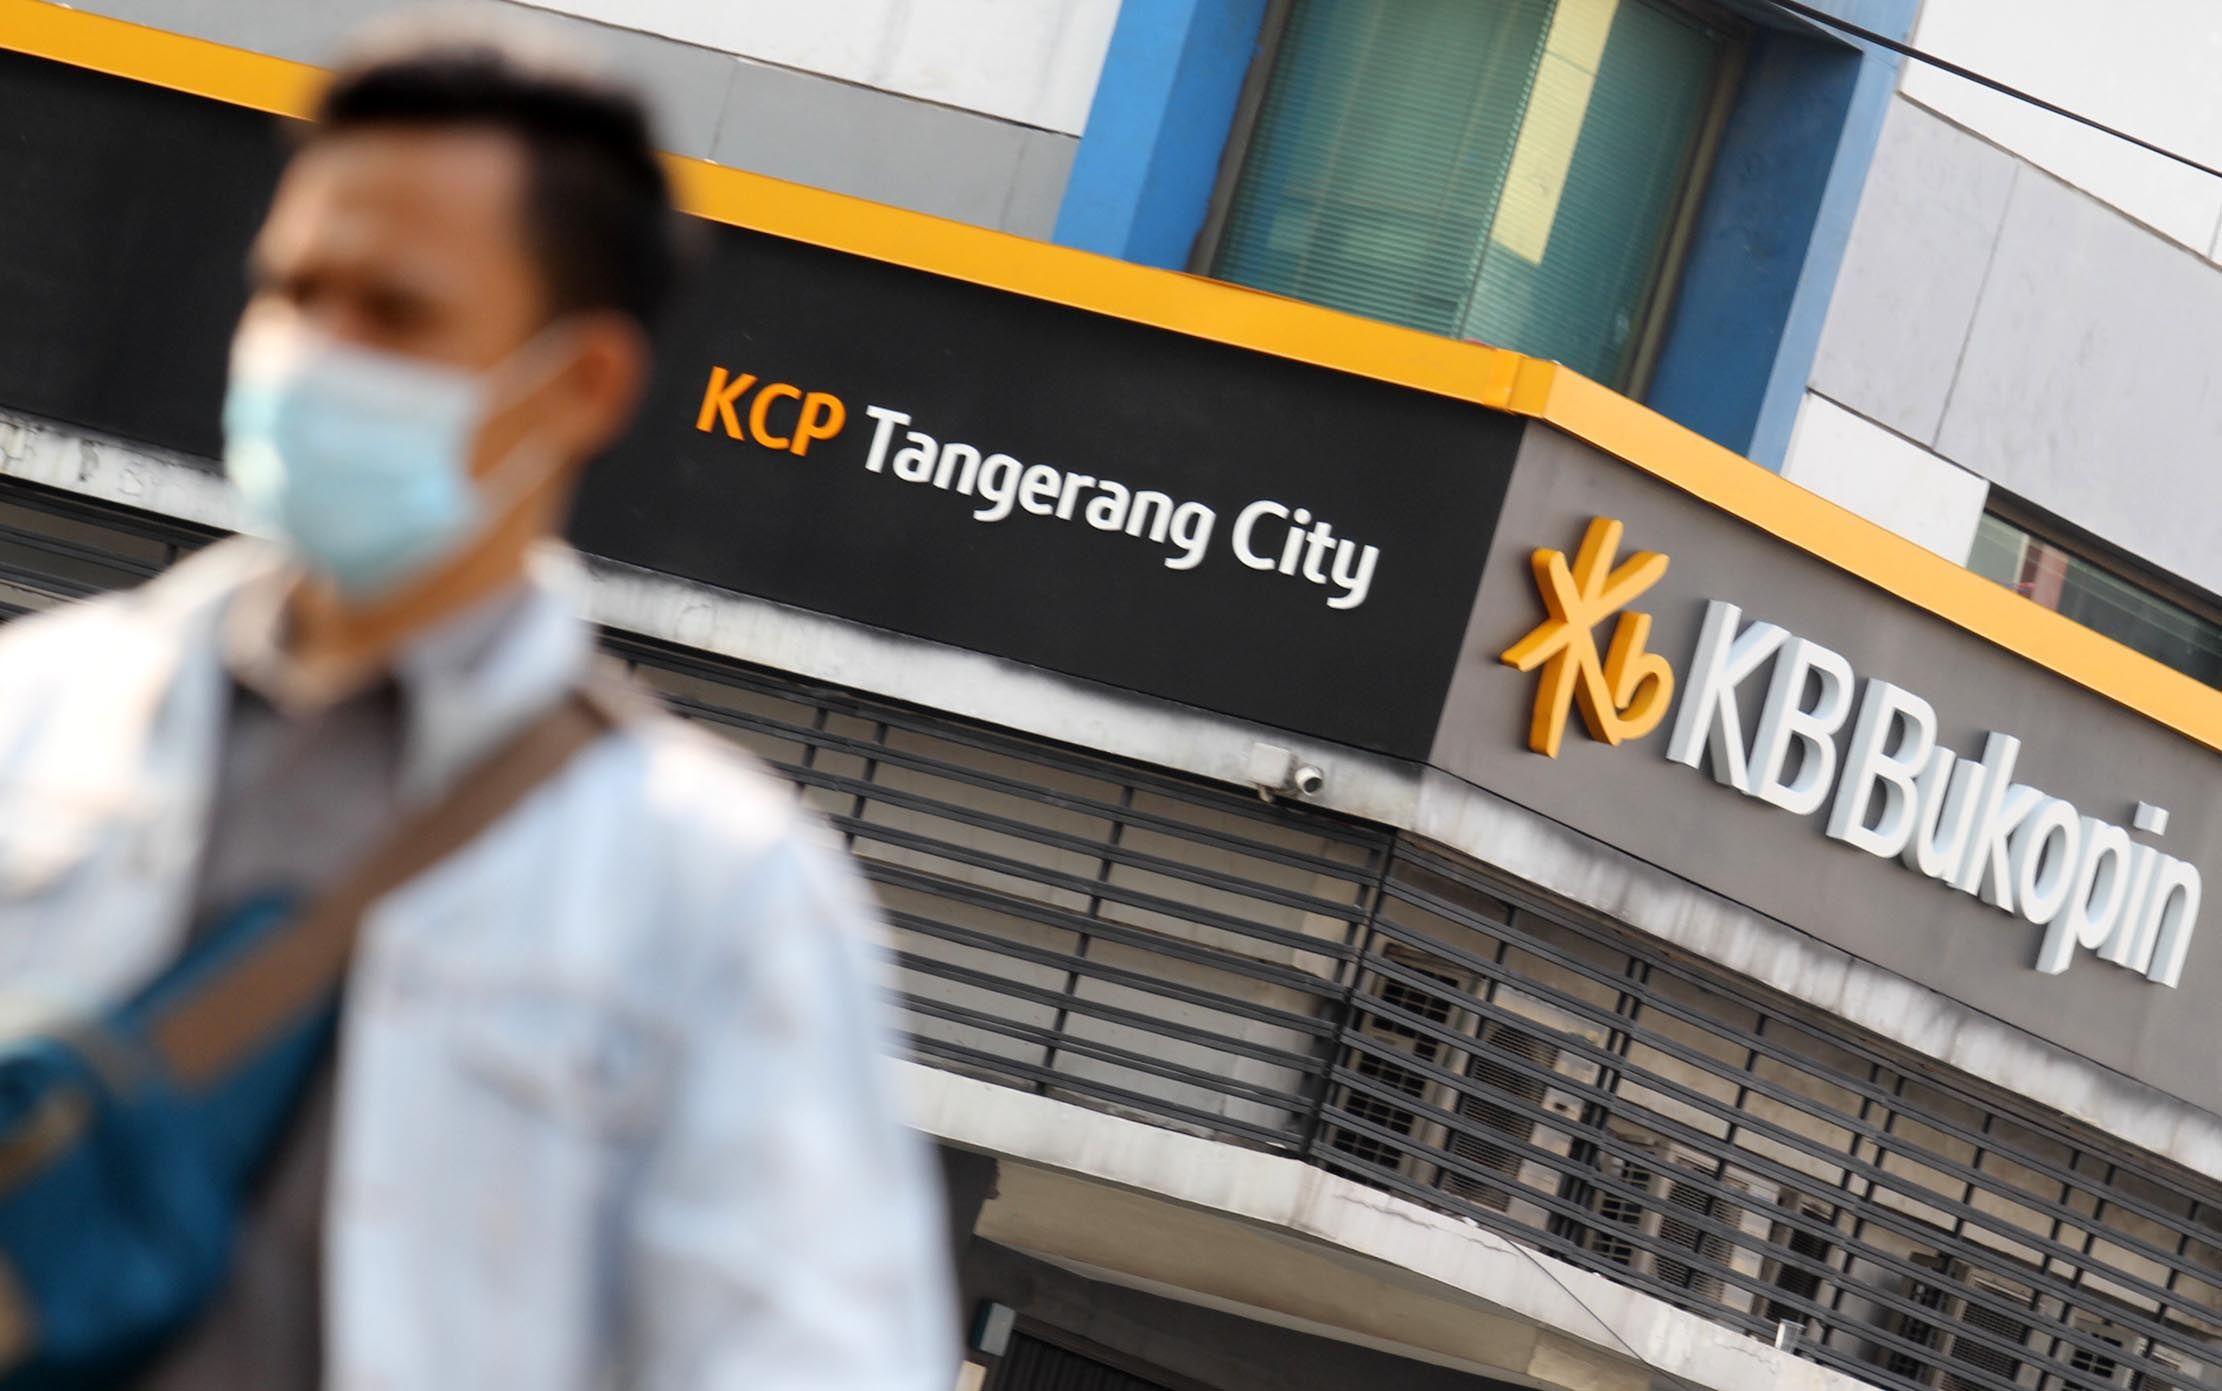 Akhirnya Bosowa dan Koperasi Pegawai Bulog Dihapus dari Pemilik Saham Bank KB Bukopin